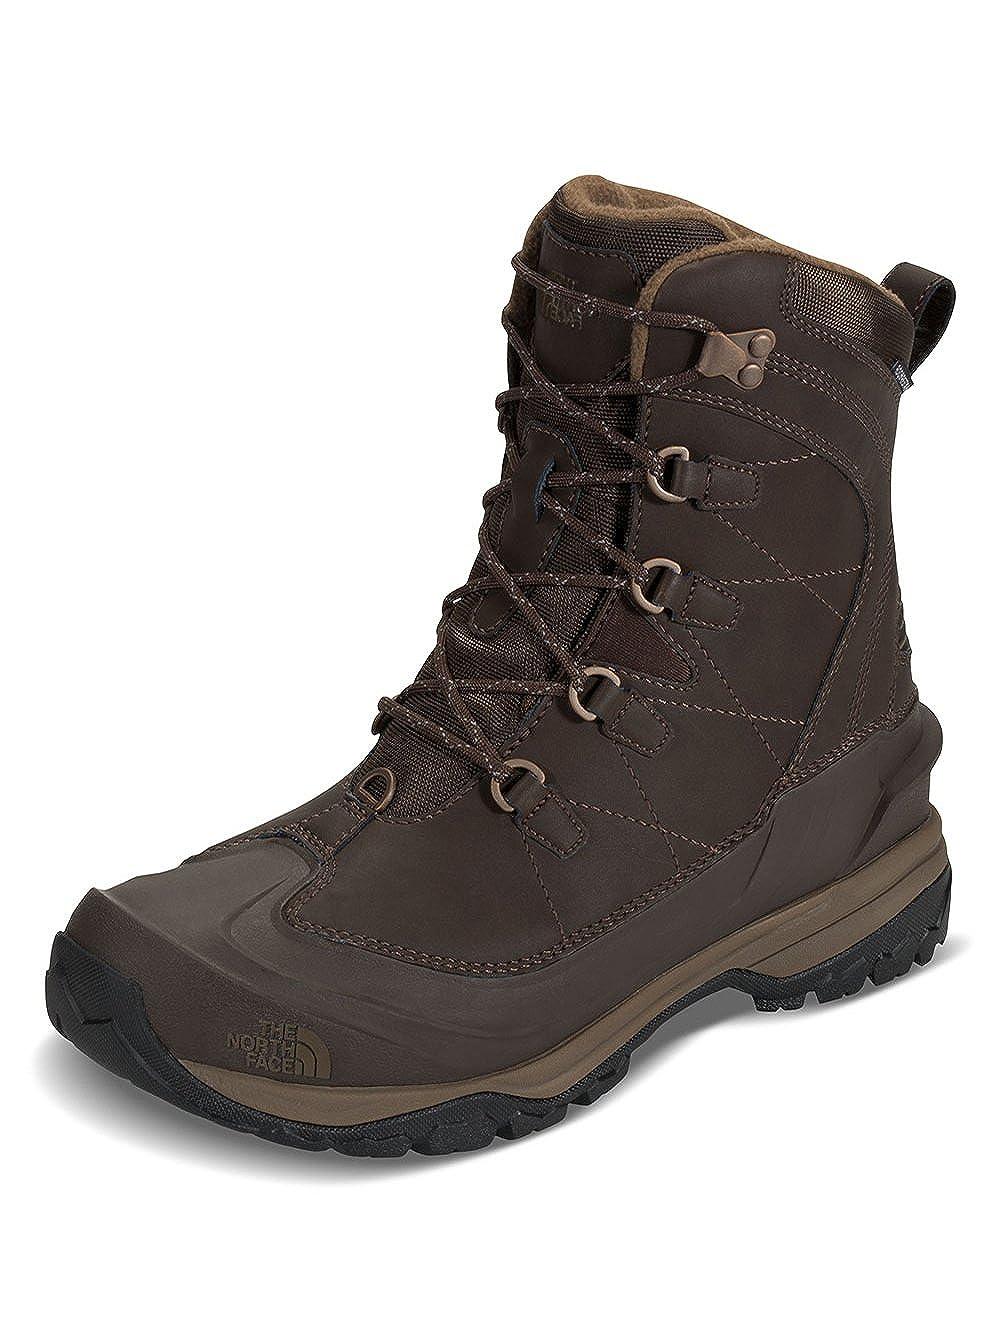 The North Face Men's Chilkat Evo Boots (Men's Sizes 7 13)